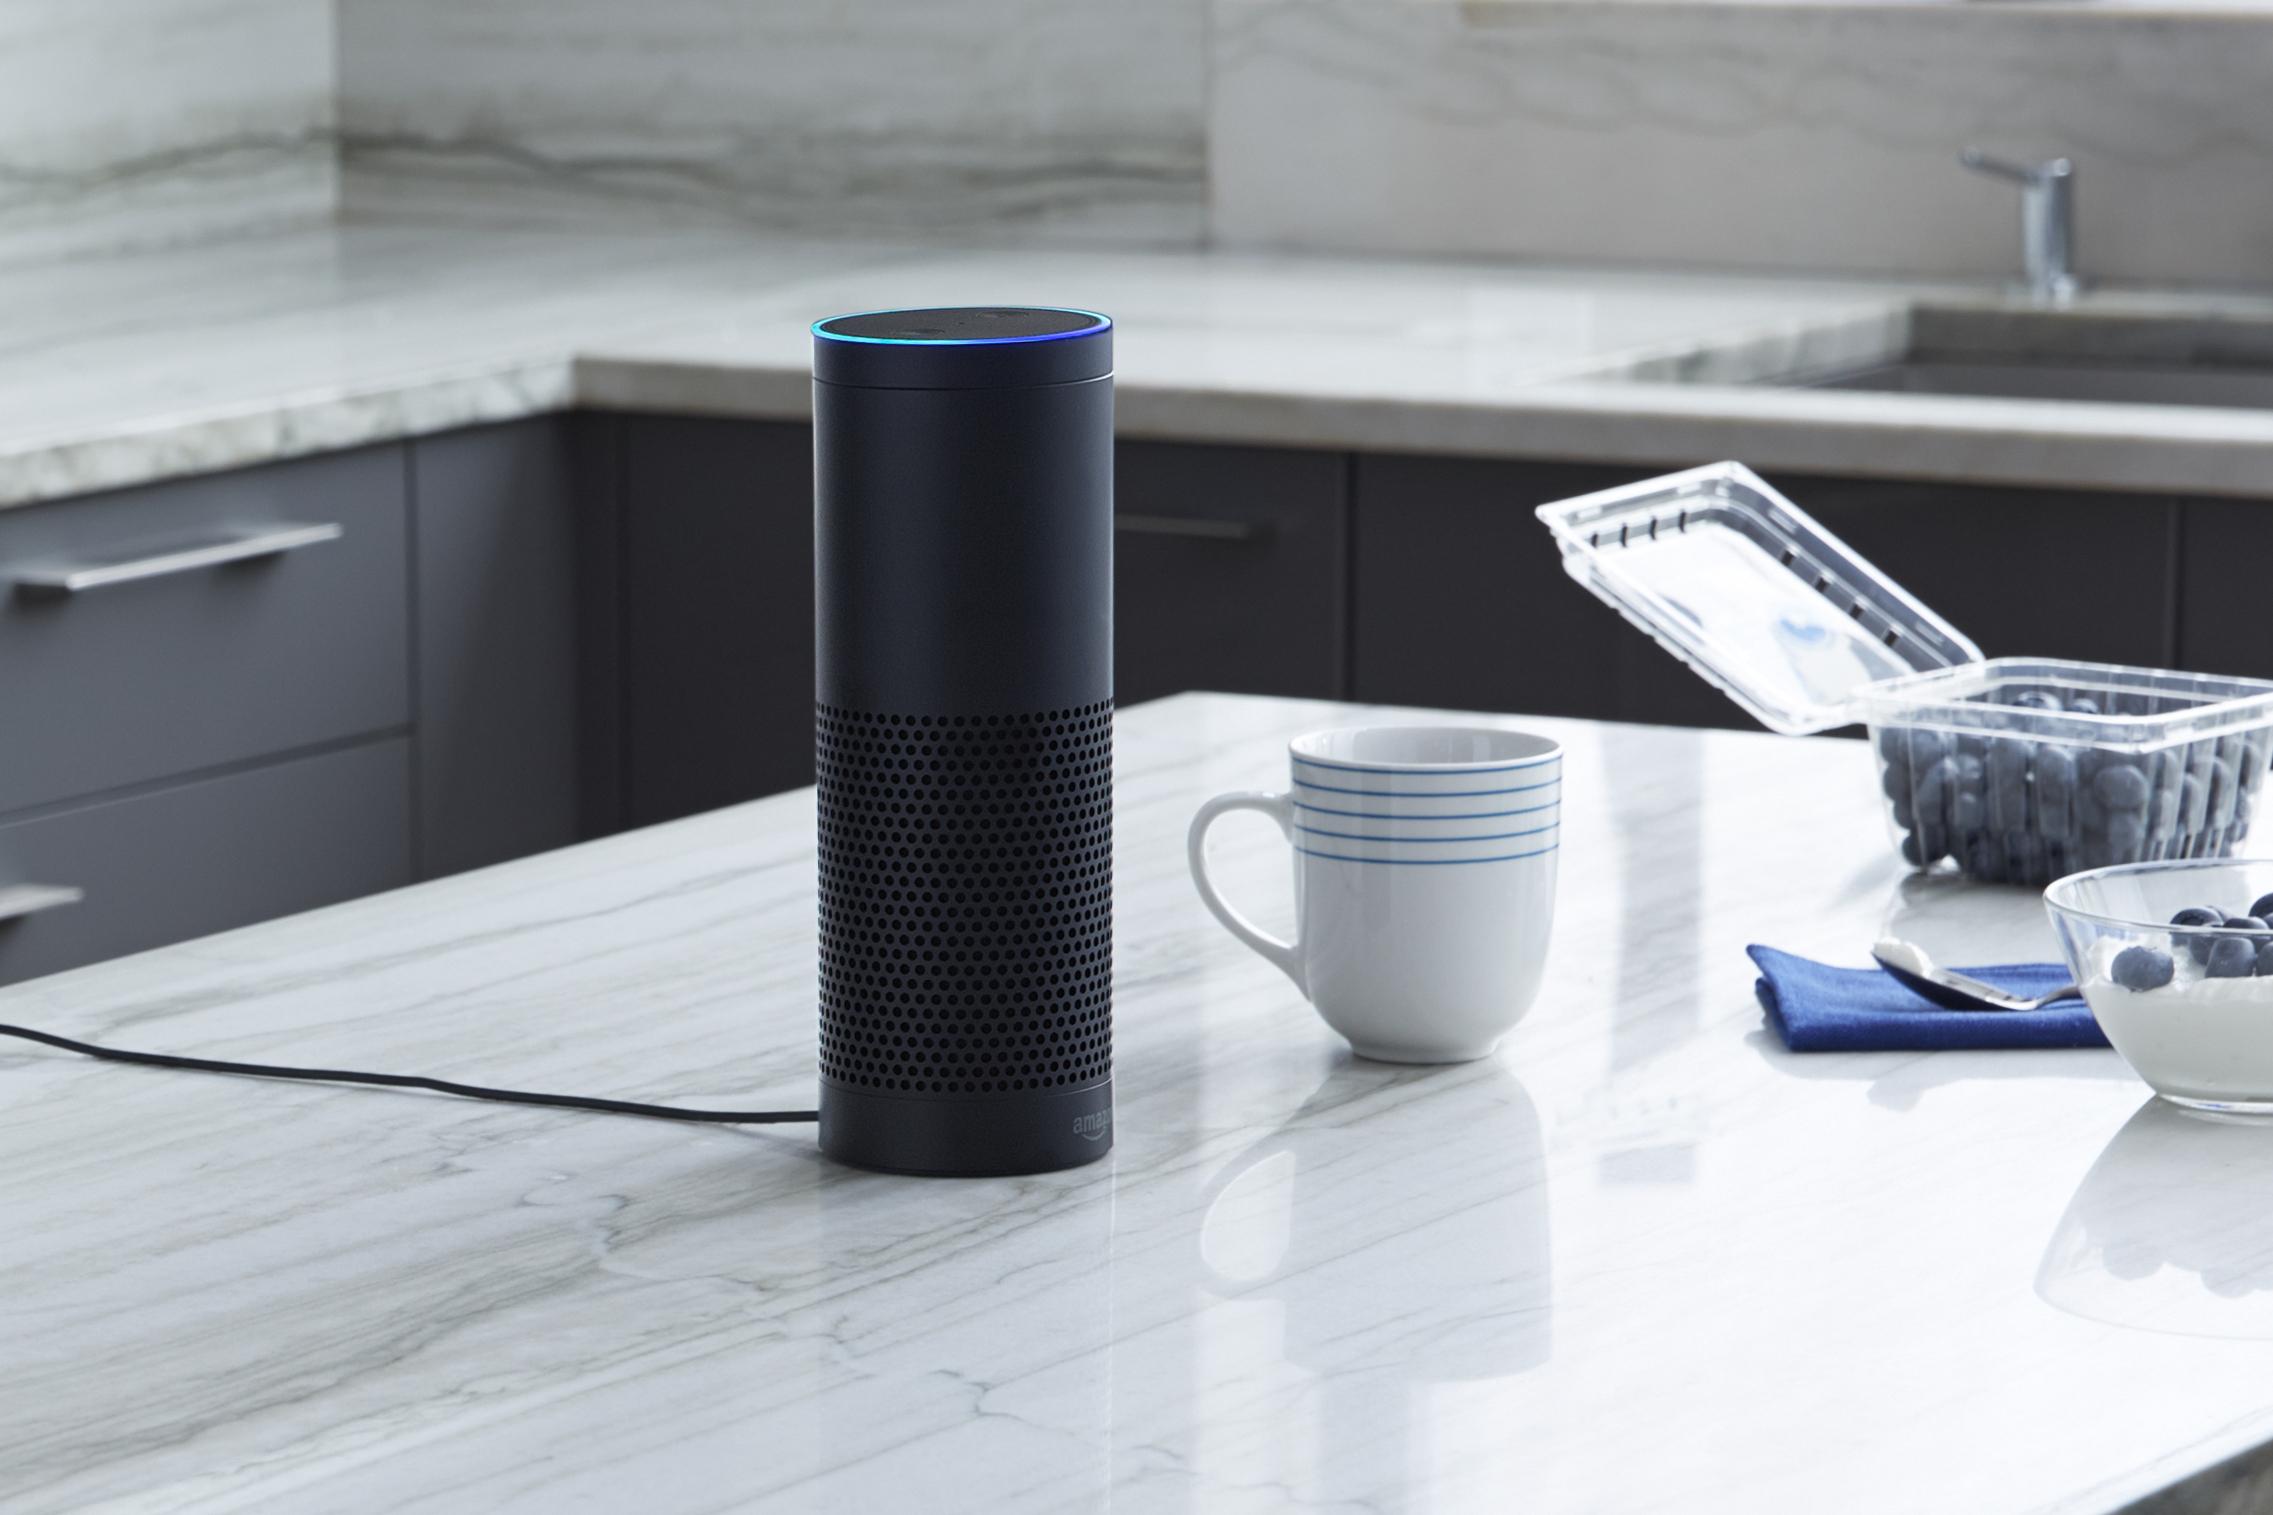 An Amazon Echo device on kitchen counter